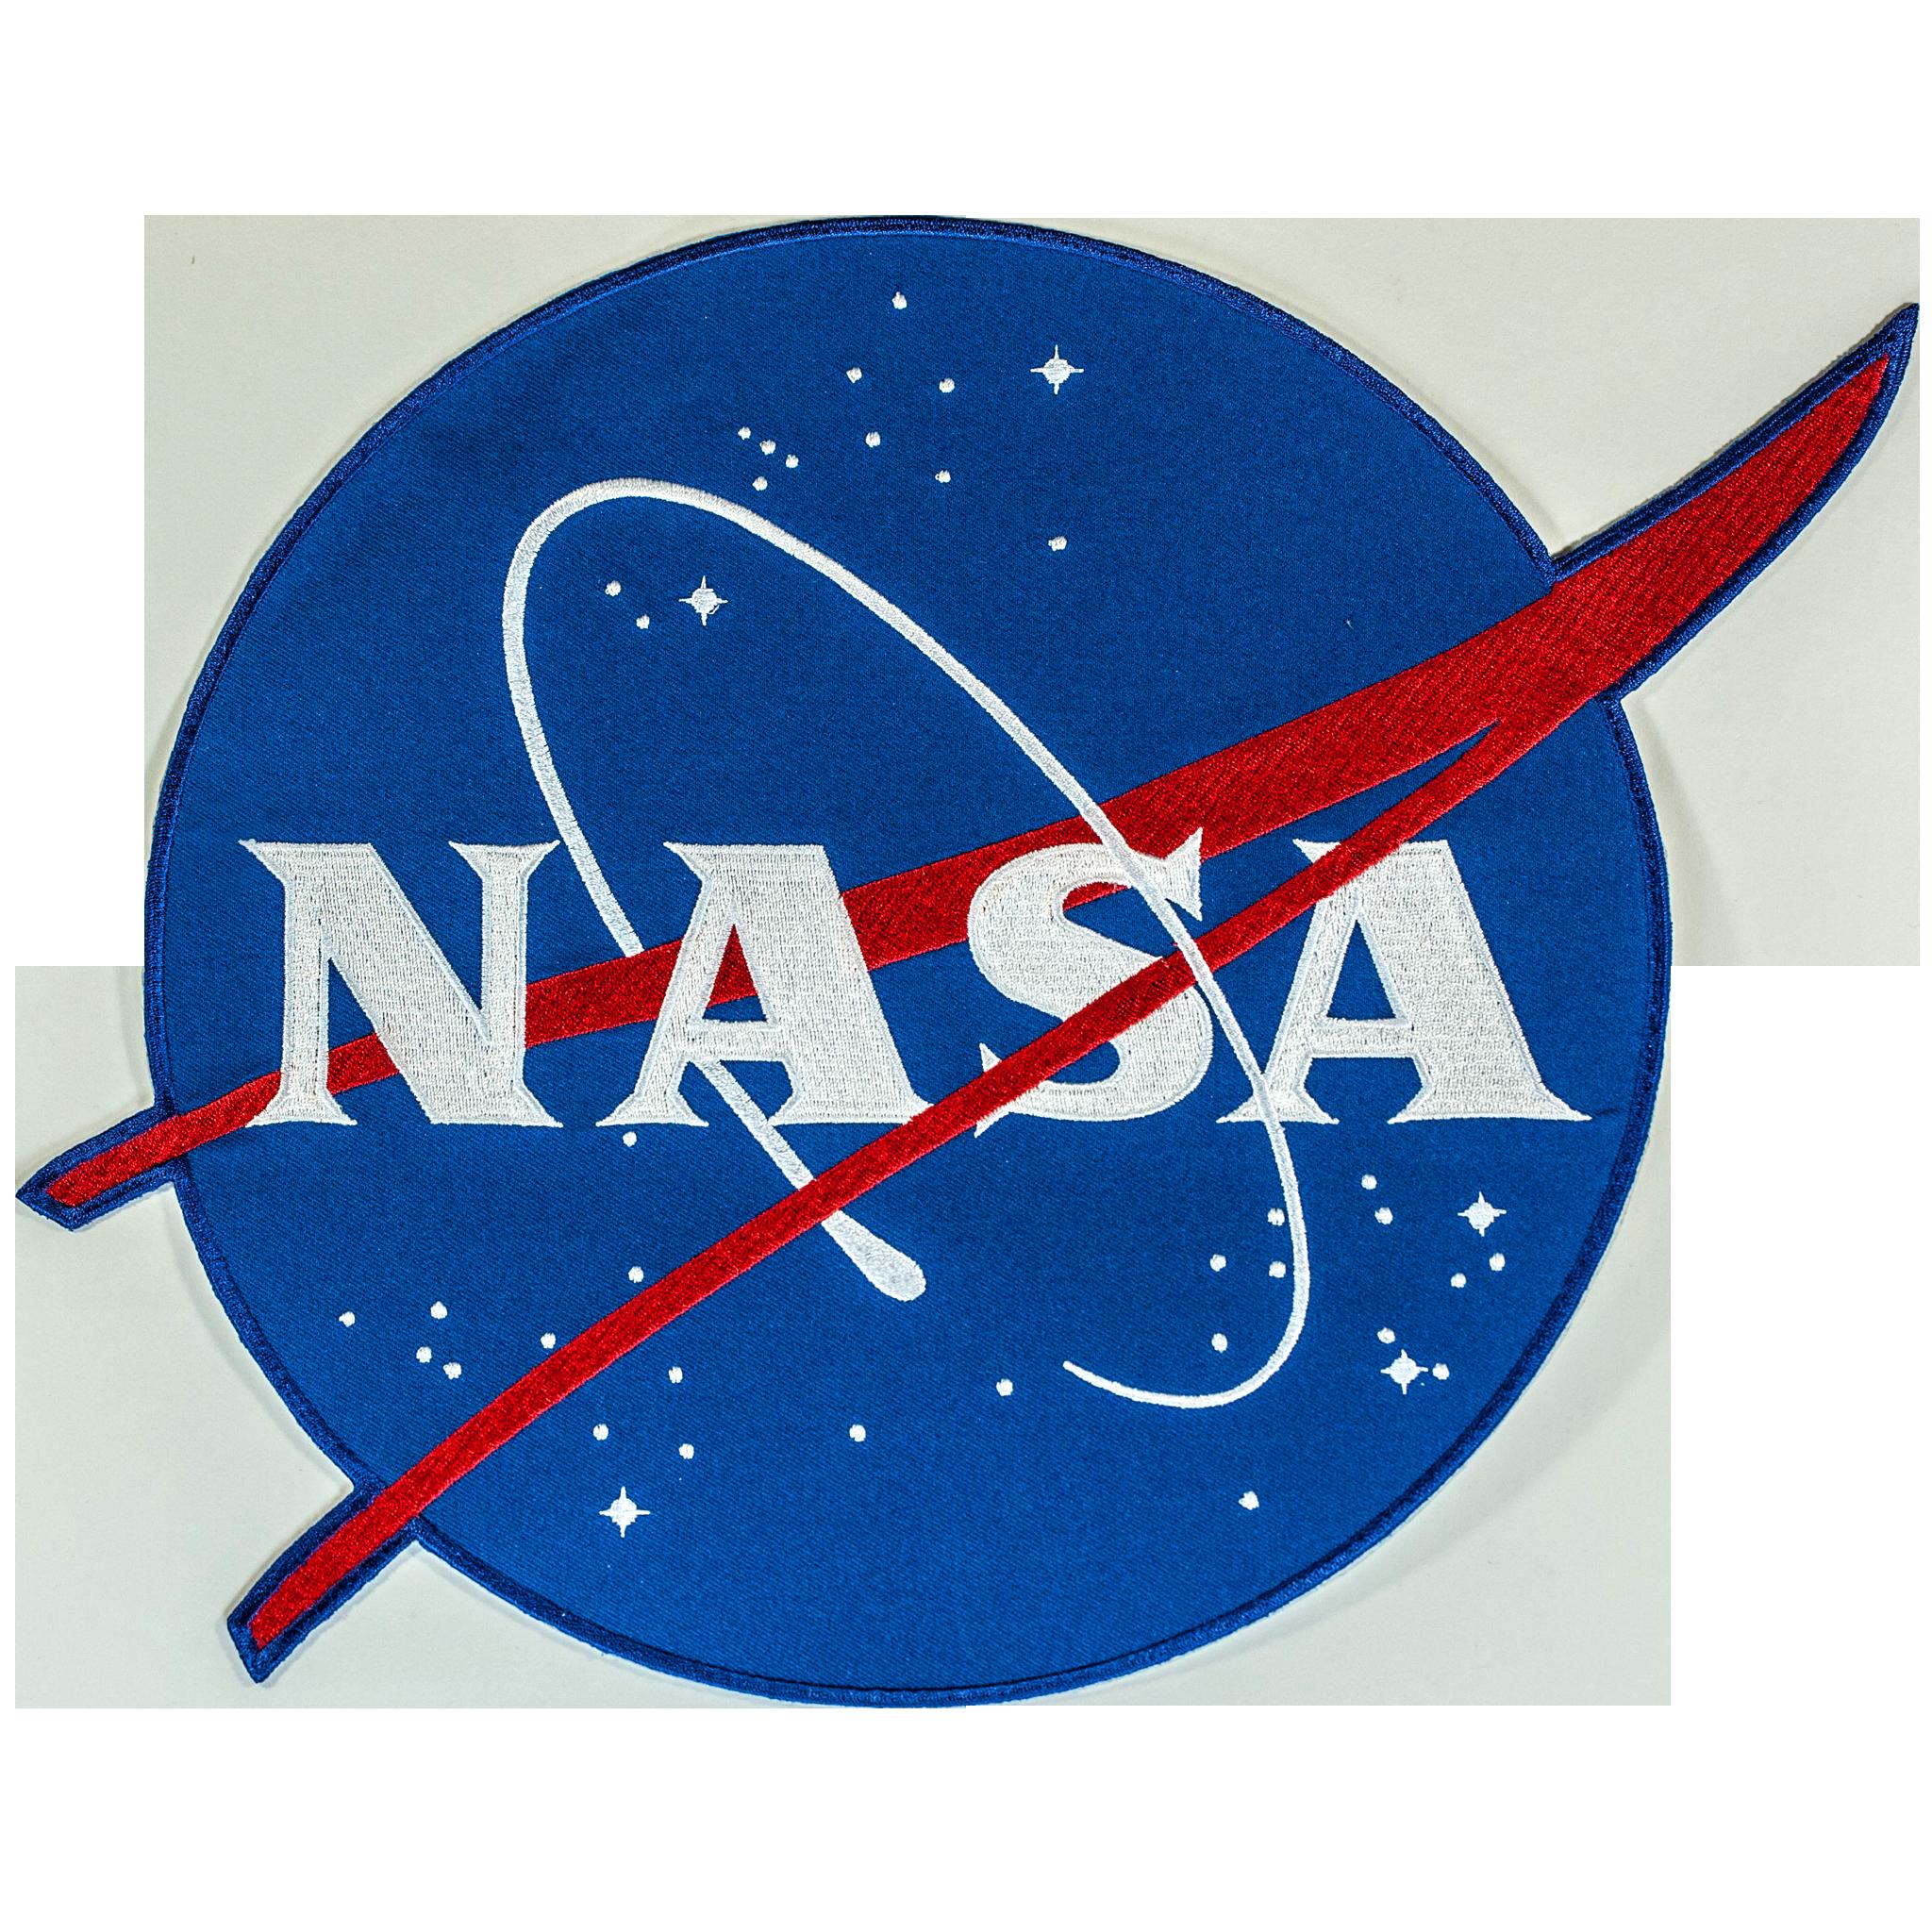 Future clipart space mission. Nasa vector big back